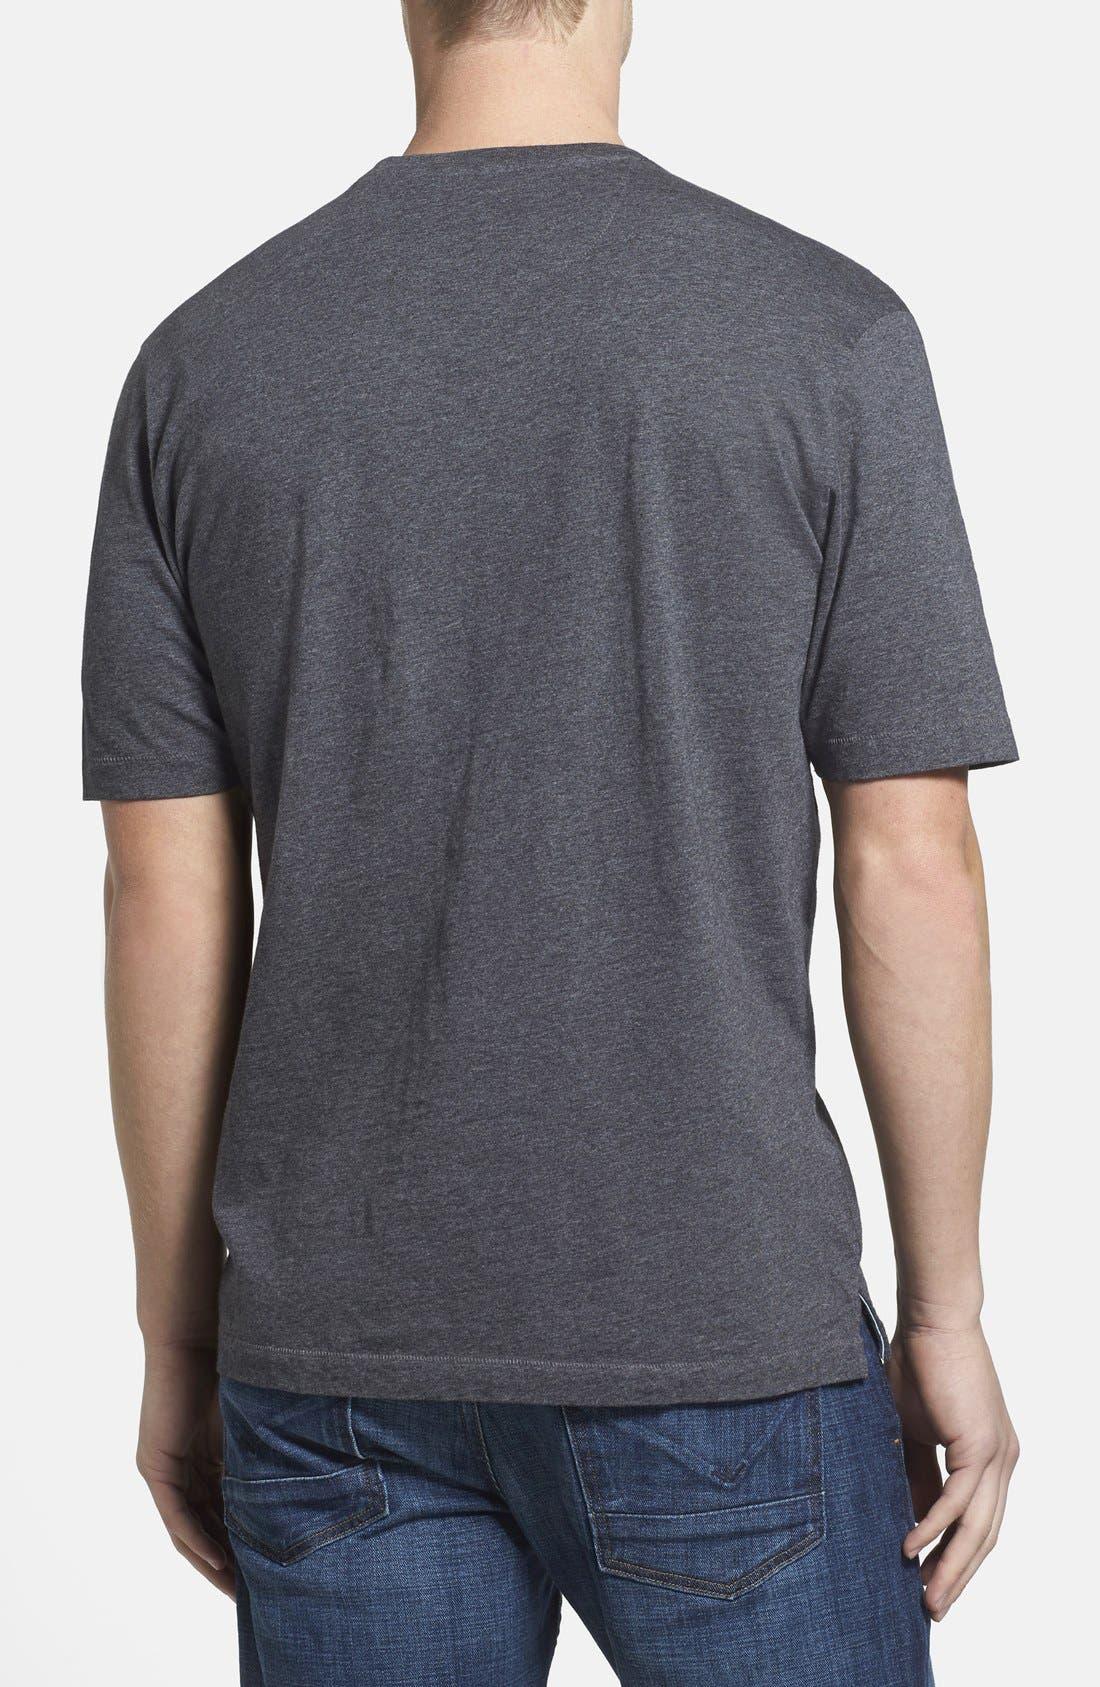 'New Bali Sky' Original Fit Crewneck Pocket T-Shirt,                             Alternate thumbnail 9, color,                             001